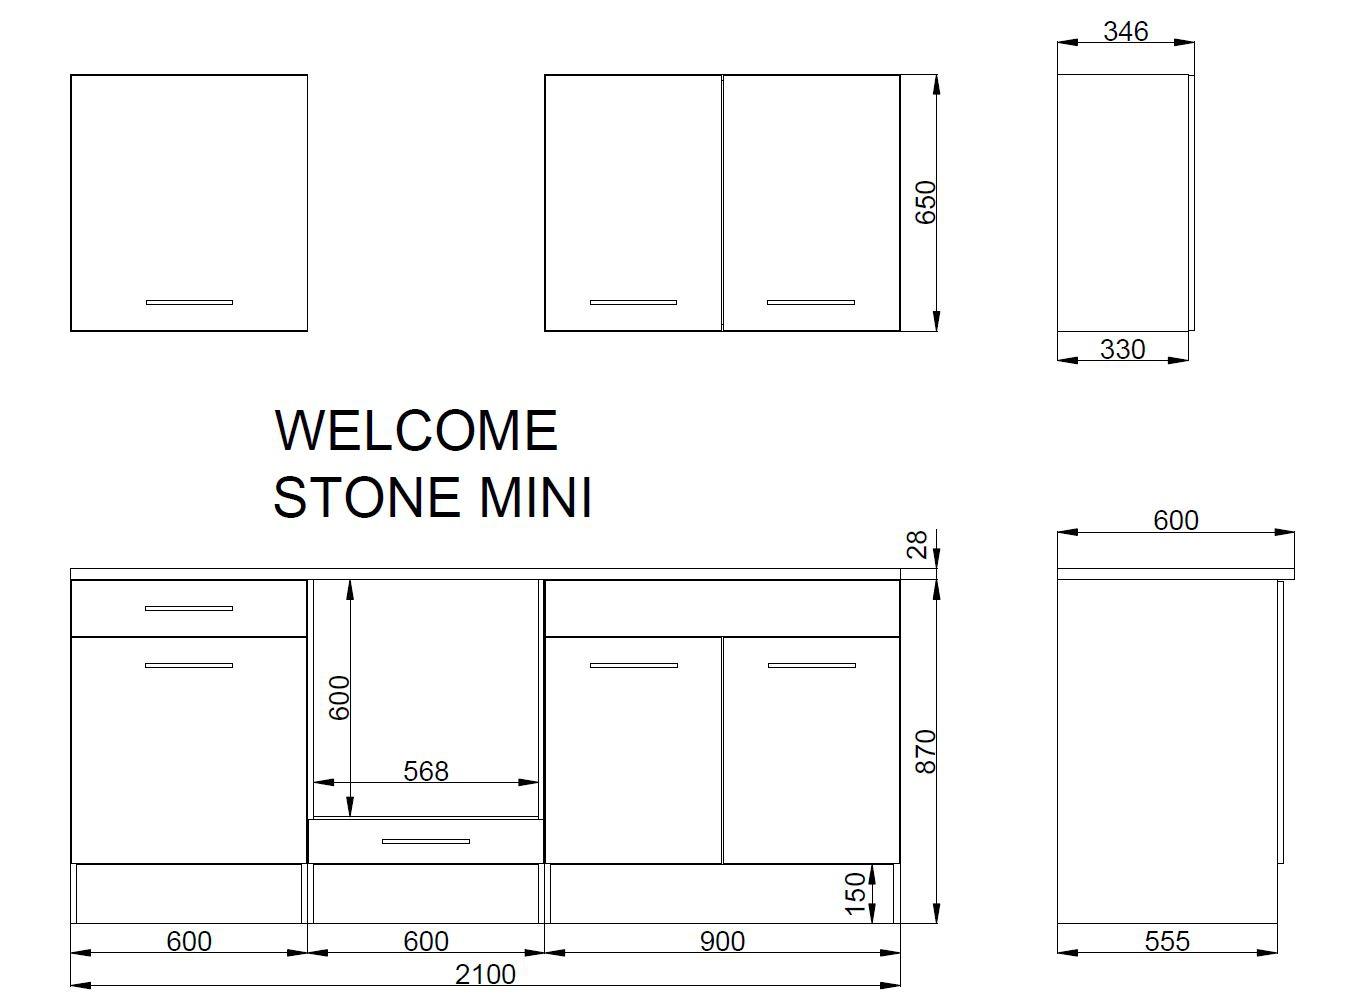 k che k chenblock k chenzeile komplettk che 210cm minik che wei grau ebay. Black Bedroom Furniture Sets. Home Design Ideas